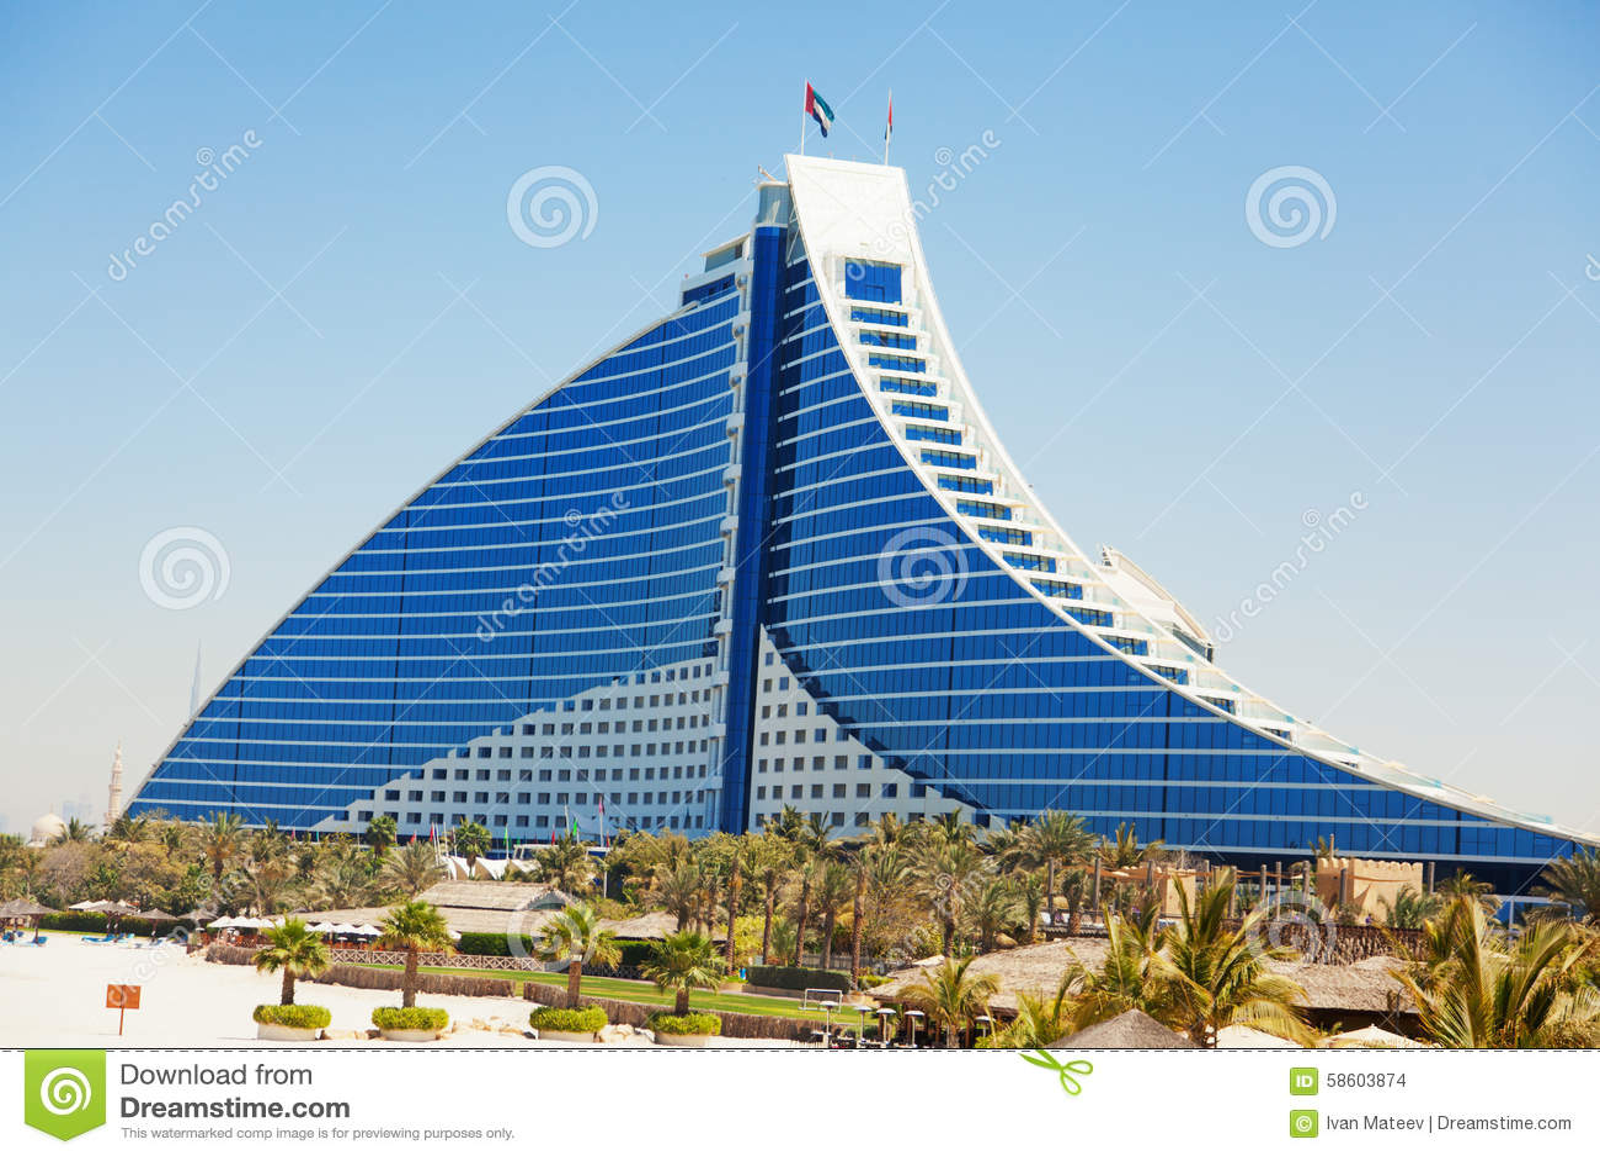 Jumeirah beach hotel dubai editorial stock image image for Best beach hotels in dubai